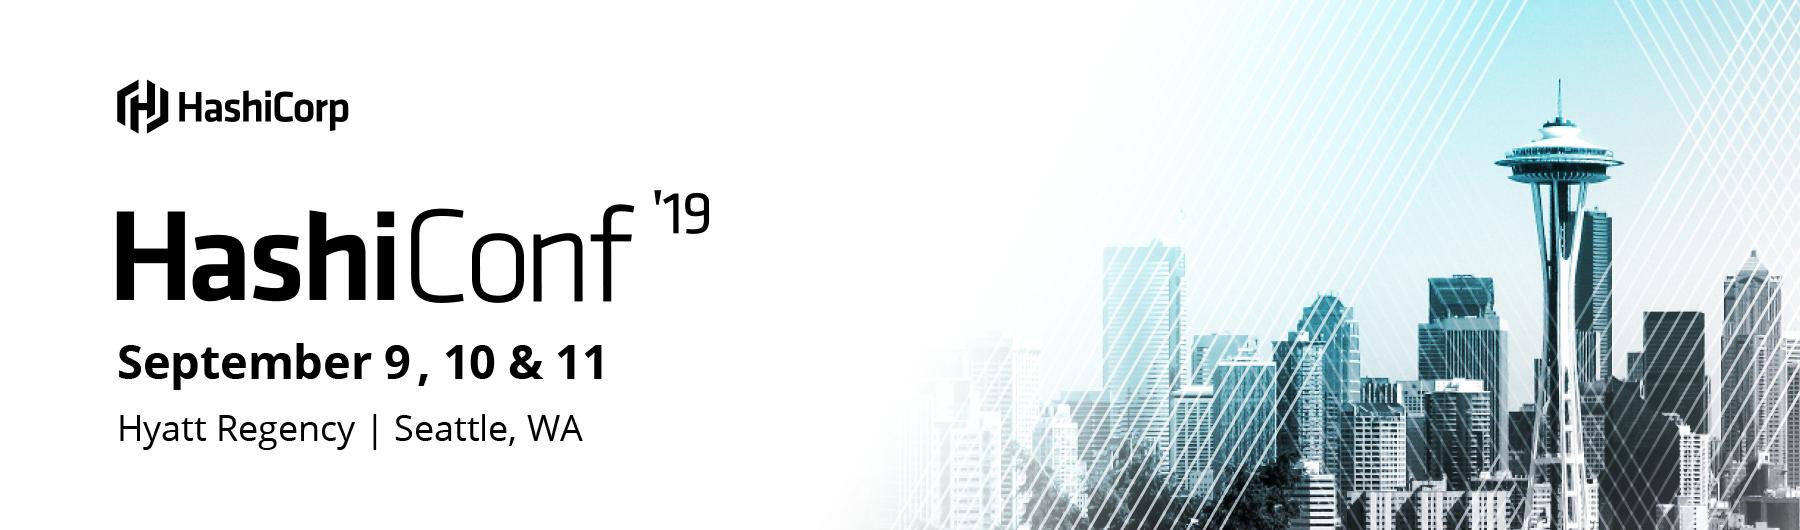 HashiConf 2019